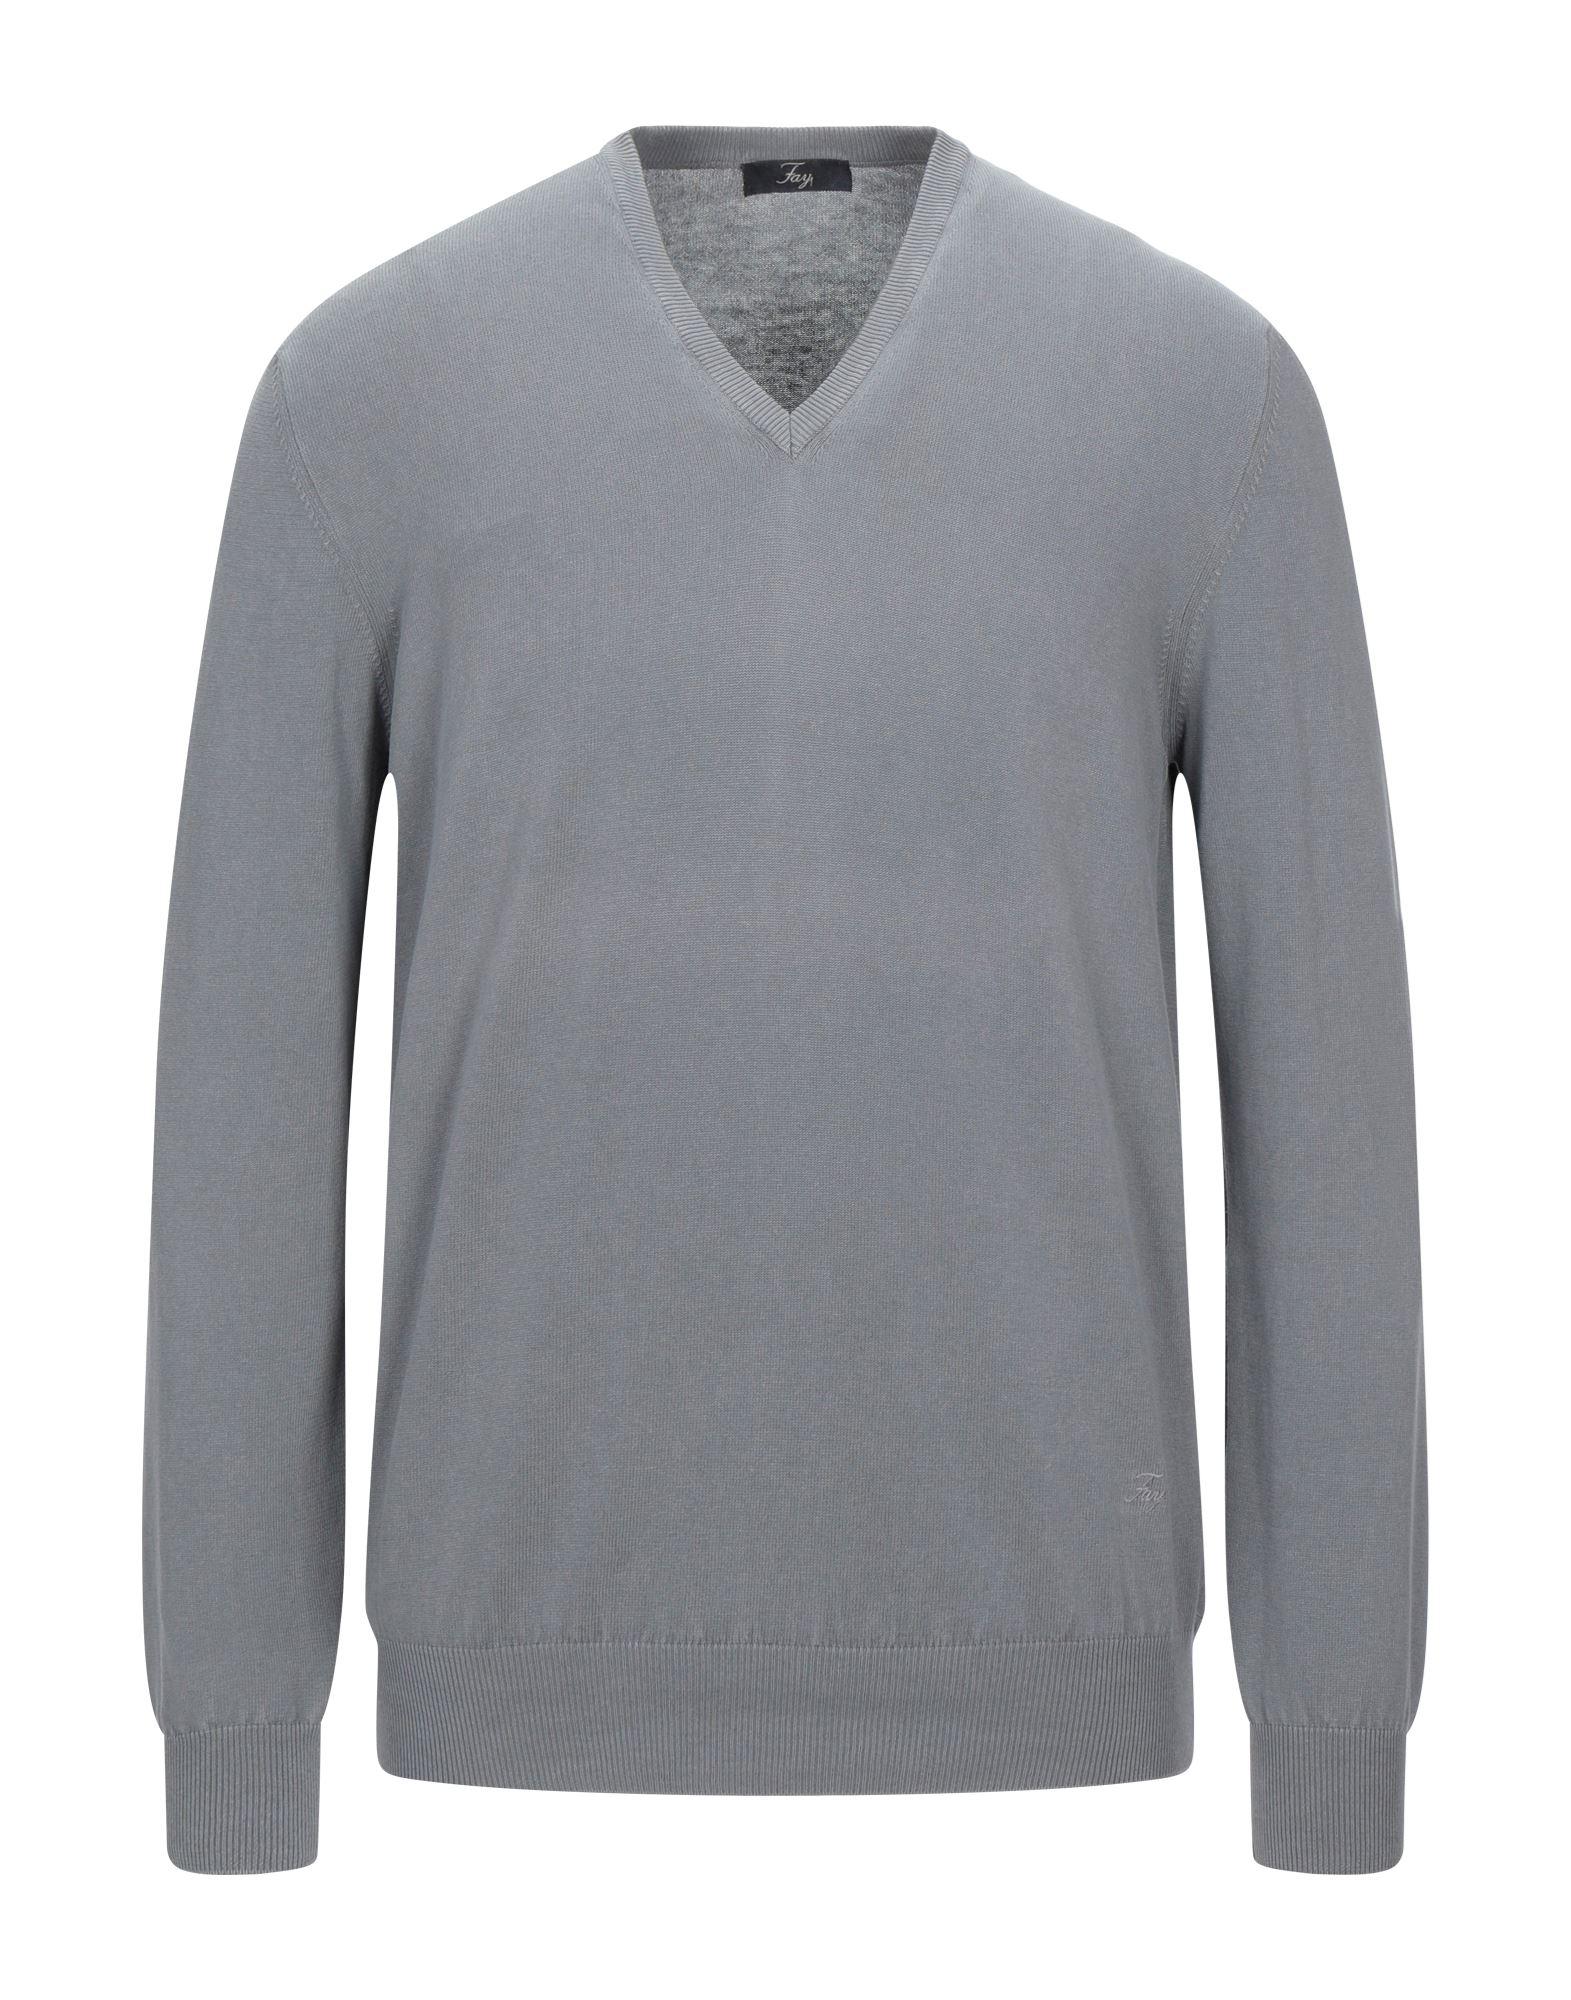 FAY Sweaters - Item 39701853